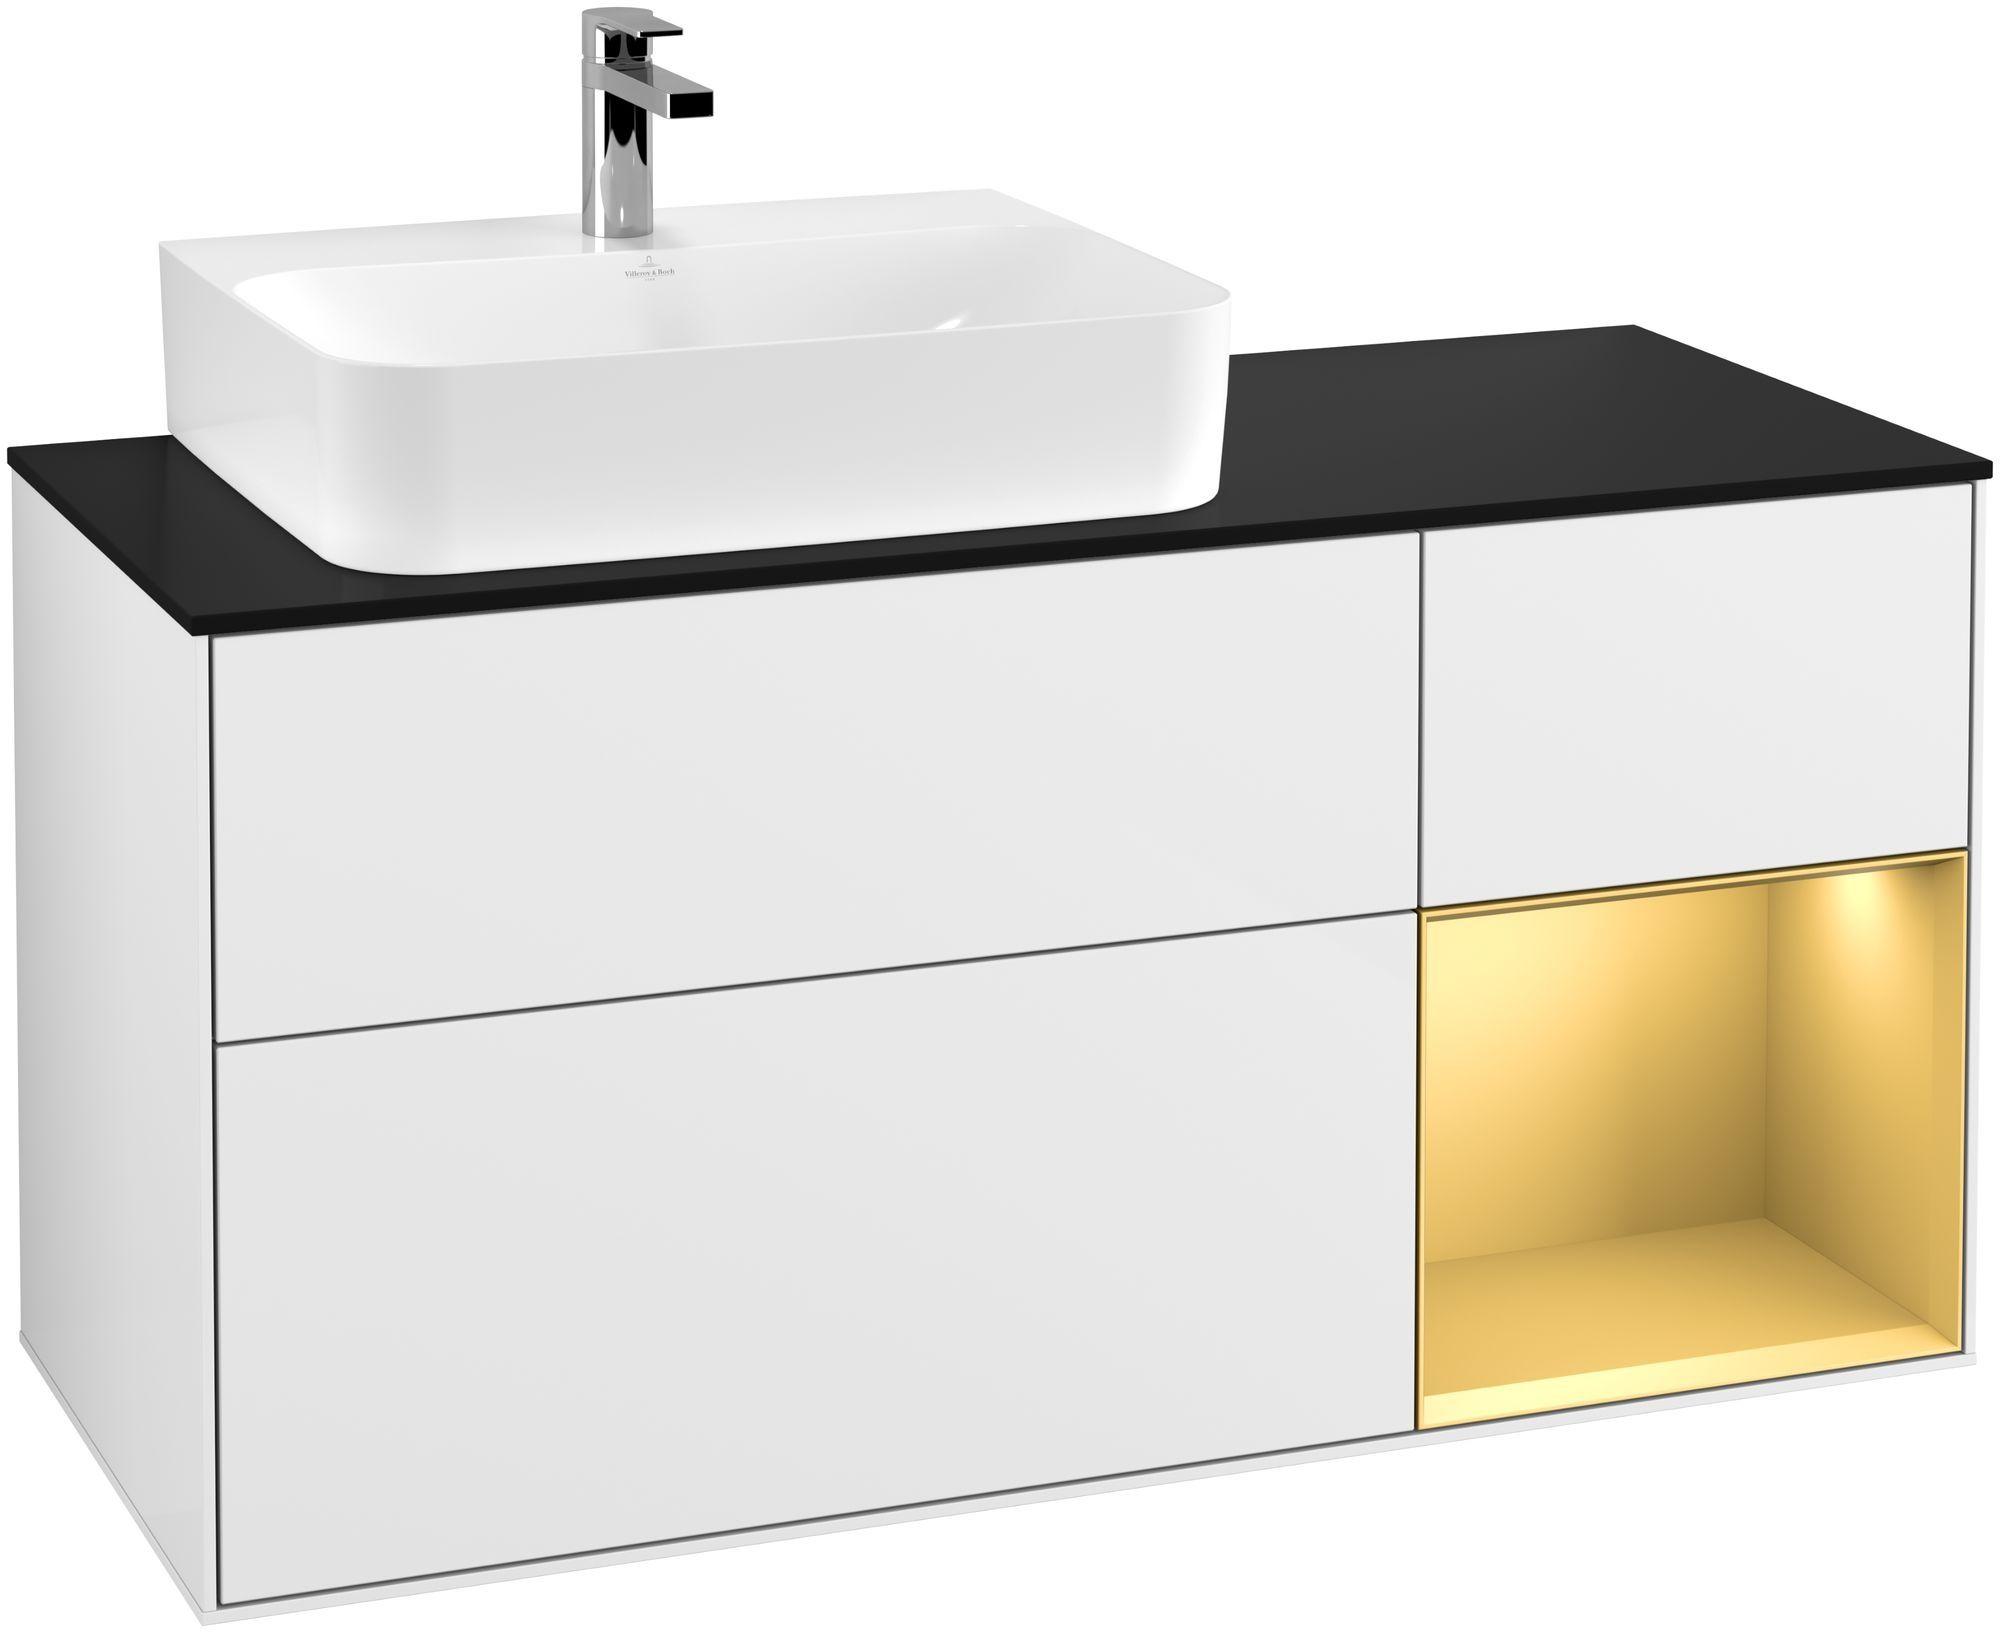 Villeroy & Boch Finion F15 Waschtischunterschrank mit Regalelement 3 Auszüge Waschtisch links LED-Beleuchtung B:120xH:60,3xT:50,1cm Front, Korpus: Glossy White Lack, Regal: Gold Matt, Glasplatte: Black Matt F152HFGF